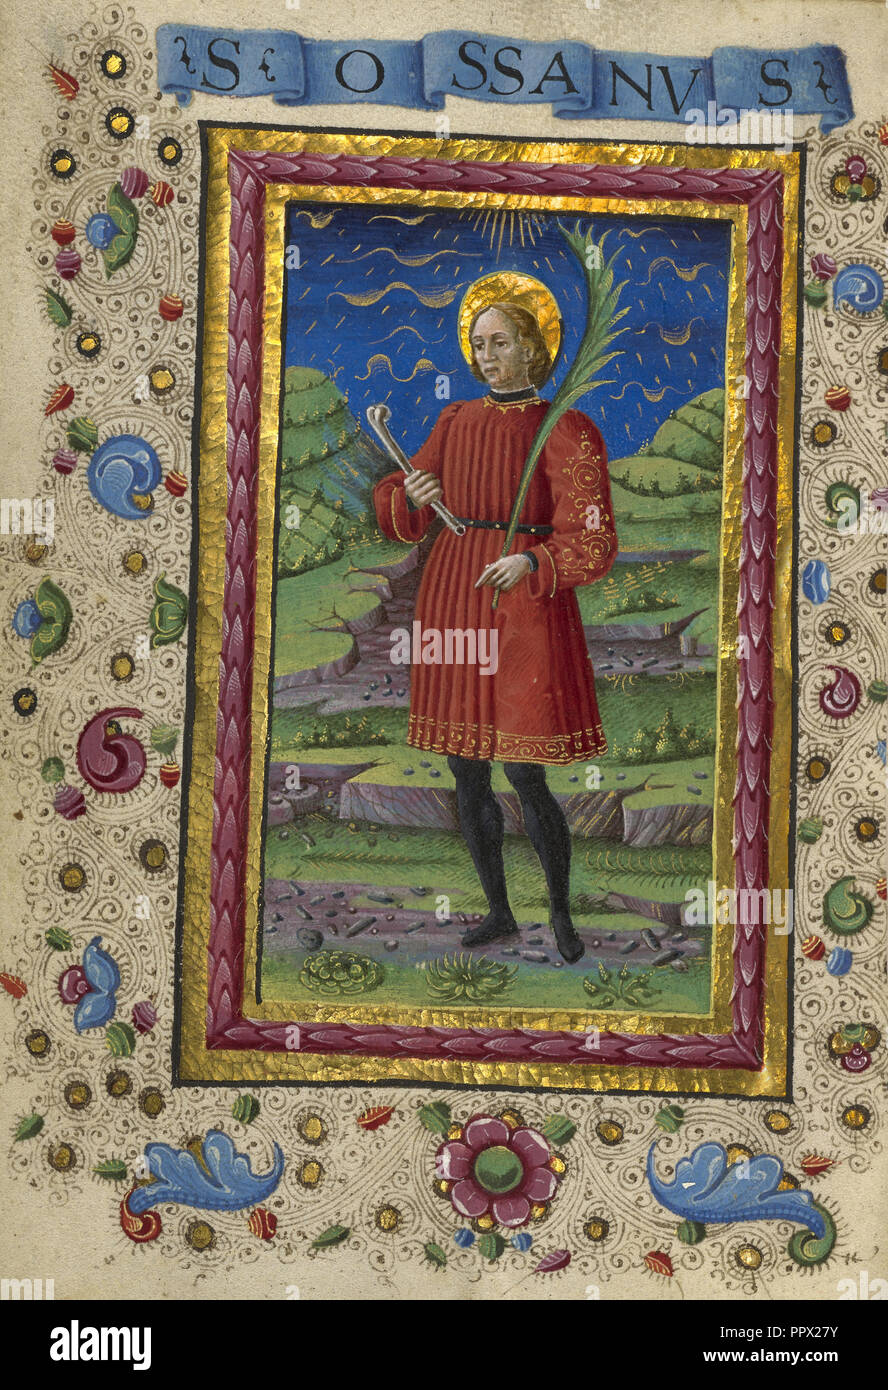 Saint Ossanus; Guglielmo Giraldi, Italian, active 1445 - 1489, Ferrara, Emilia-Romagna, Italy; about 1469; Tempera colors, gold Stock Photo